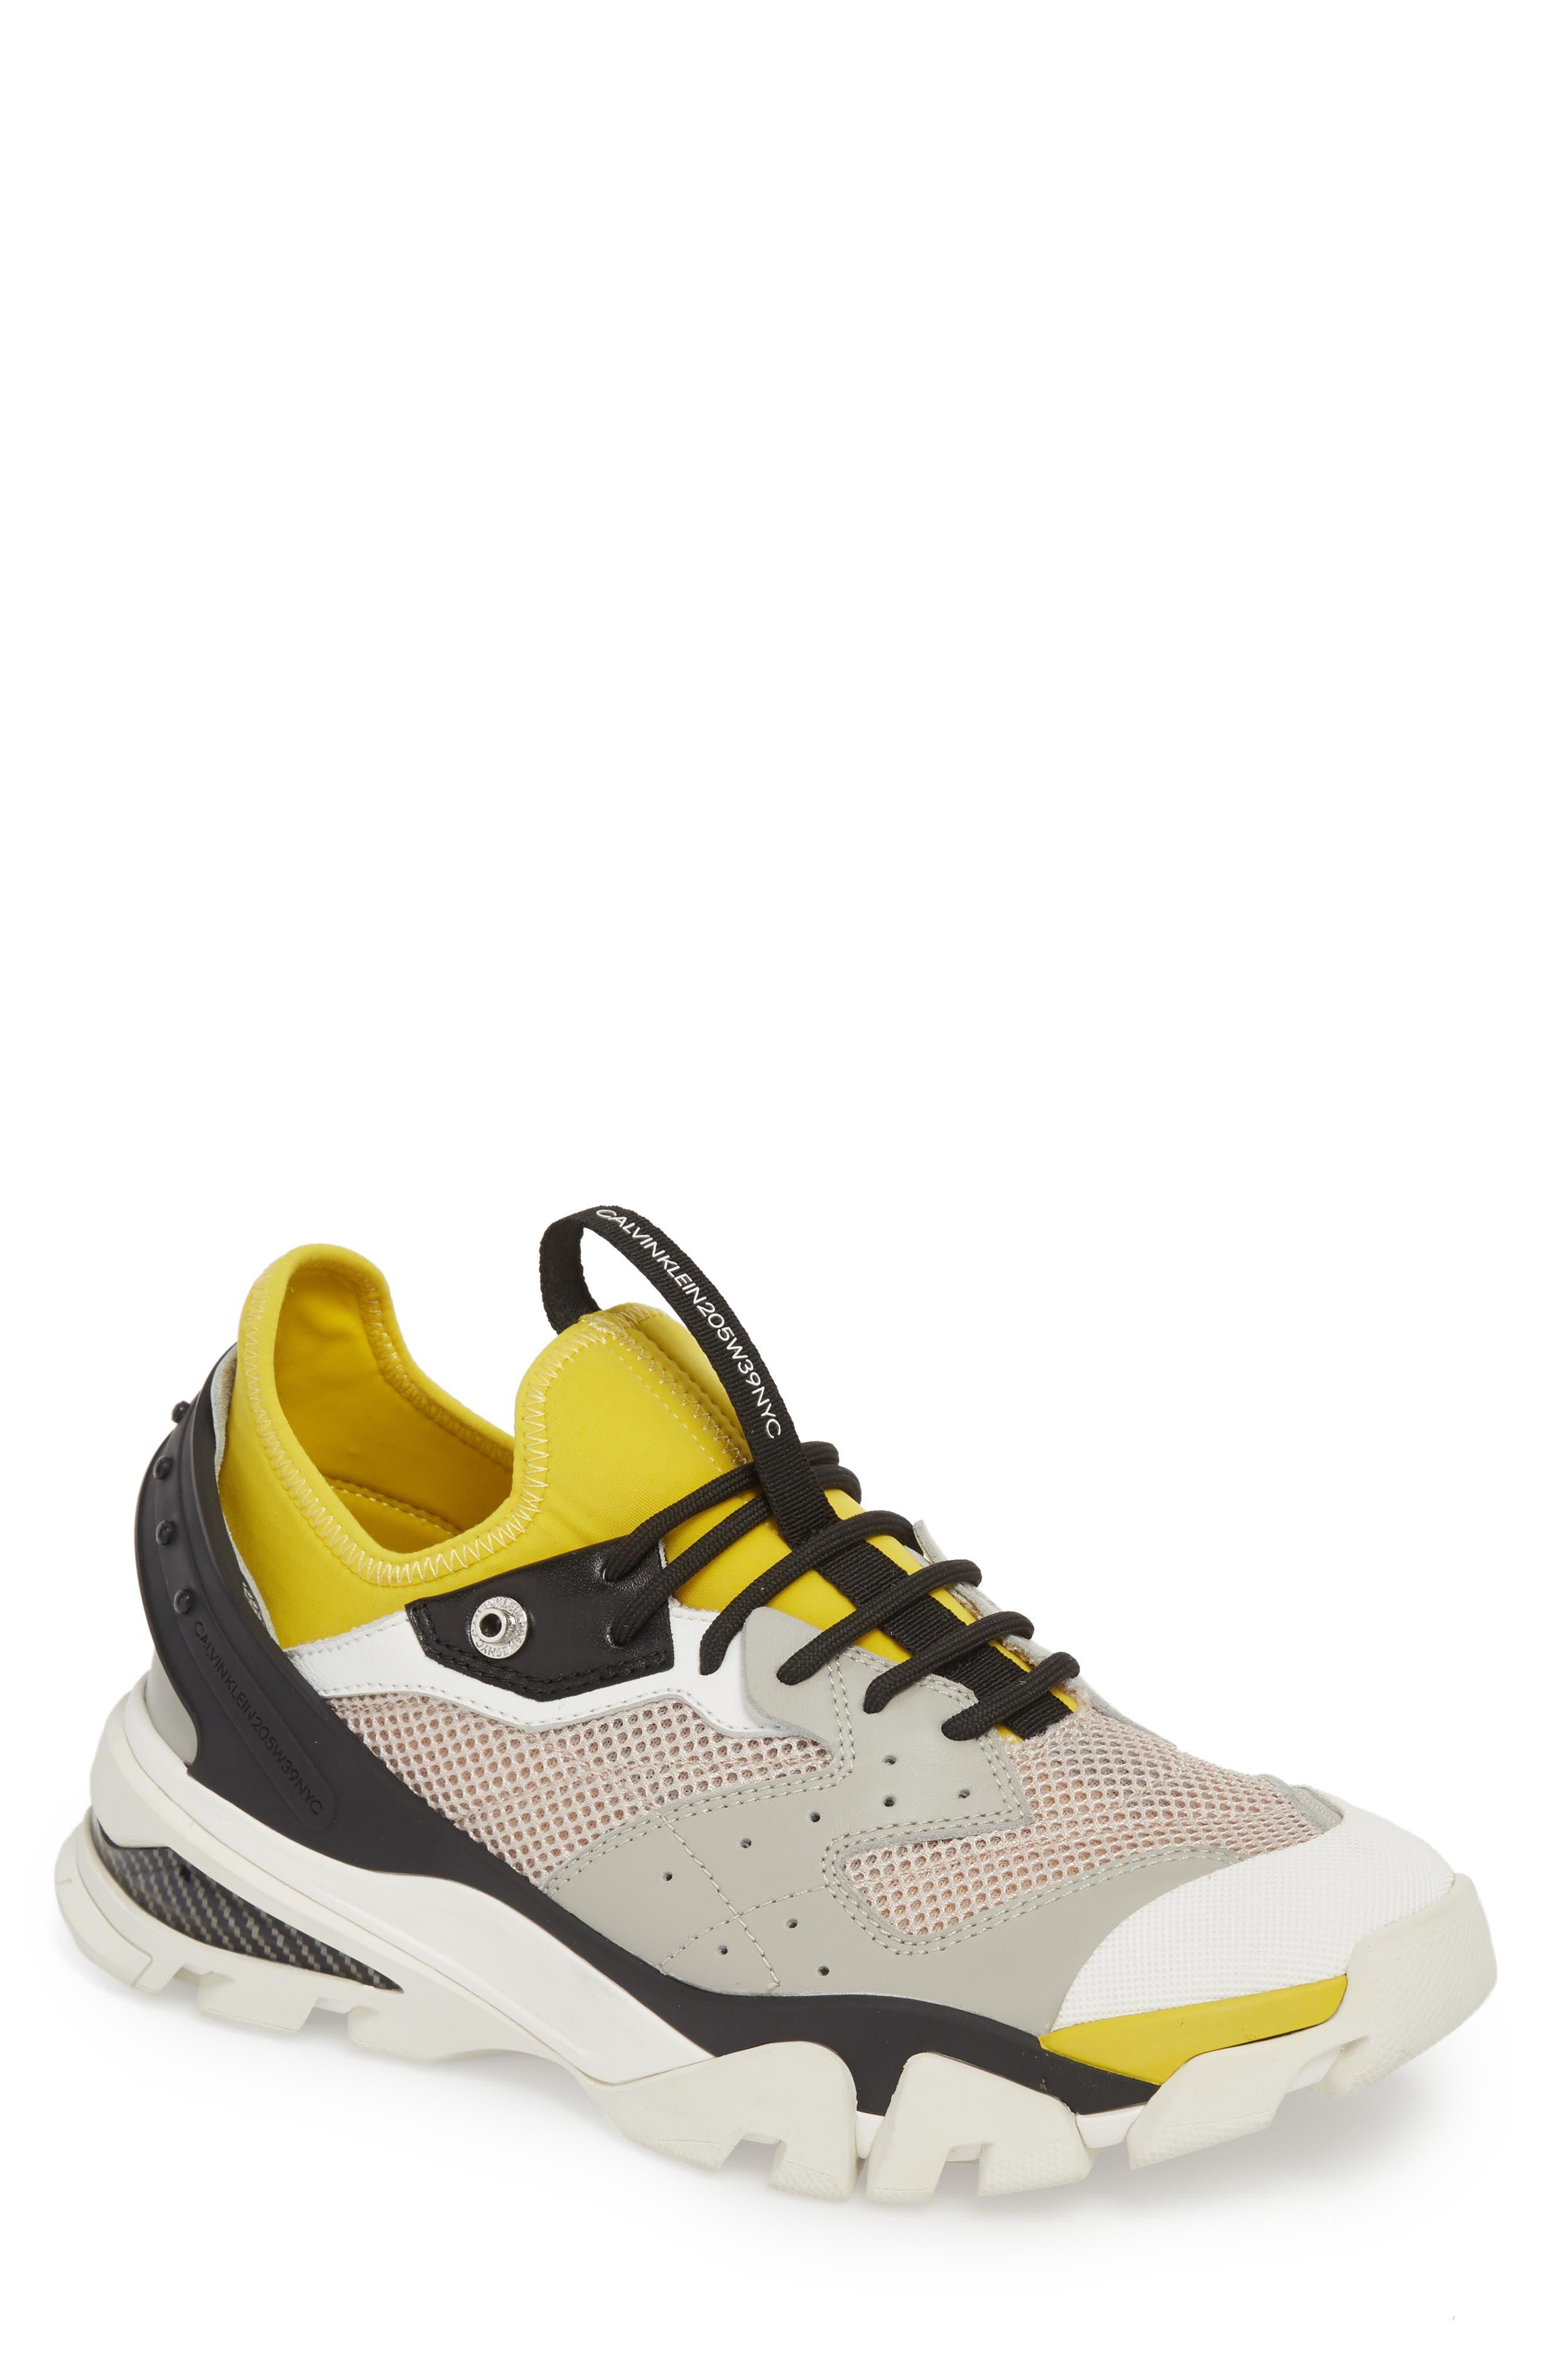 Carlos 10 Snapback Runner Sneaker,                             Main thumbnail 1, color,                             GREY/ YELLOW/ BLACK/ WHITE